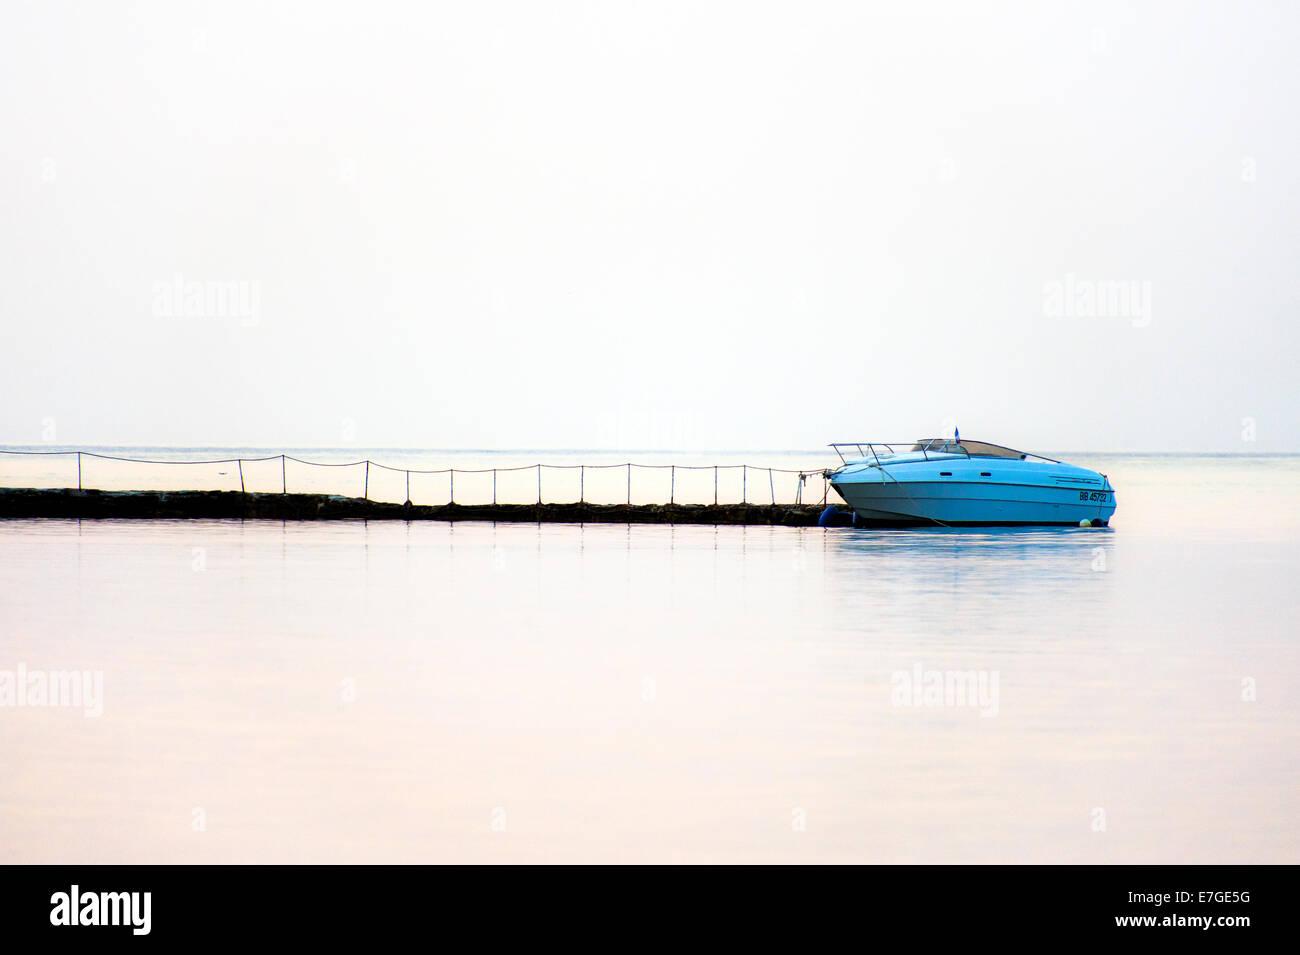 Europe, France, Corsica, Haute Corse, Cap Corse. Saint Florent. Anchored boat. - Stock Image